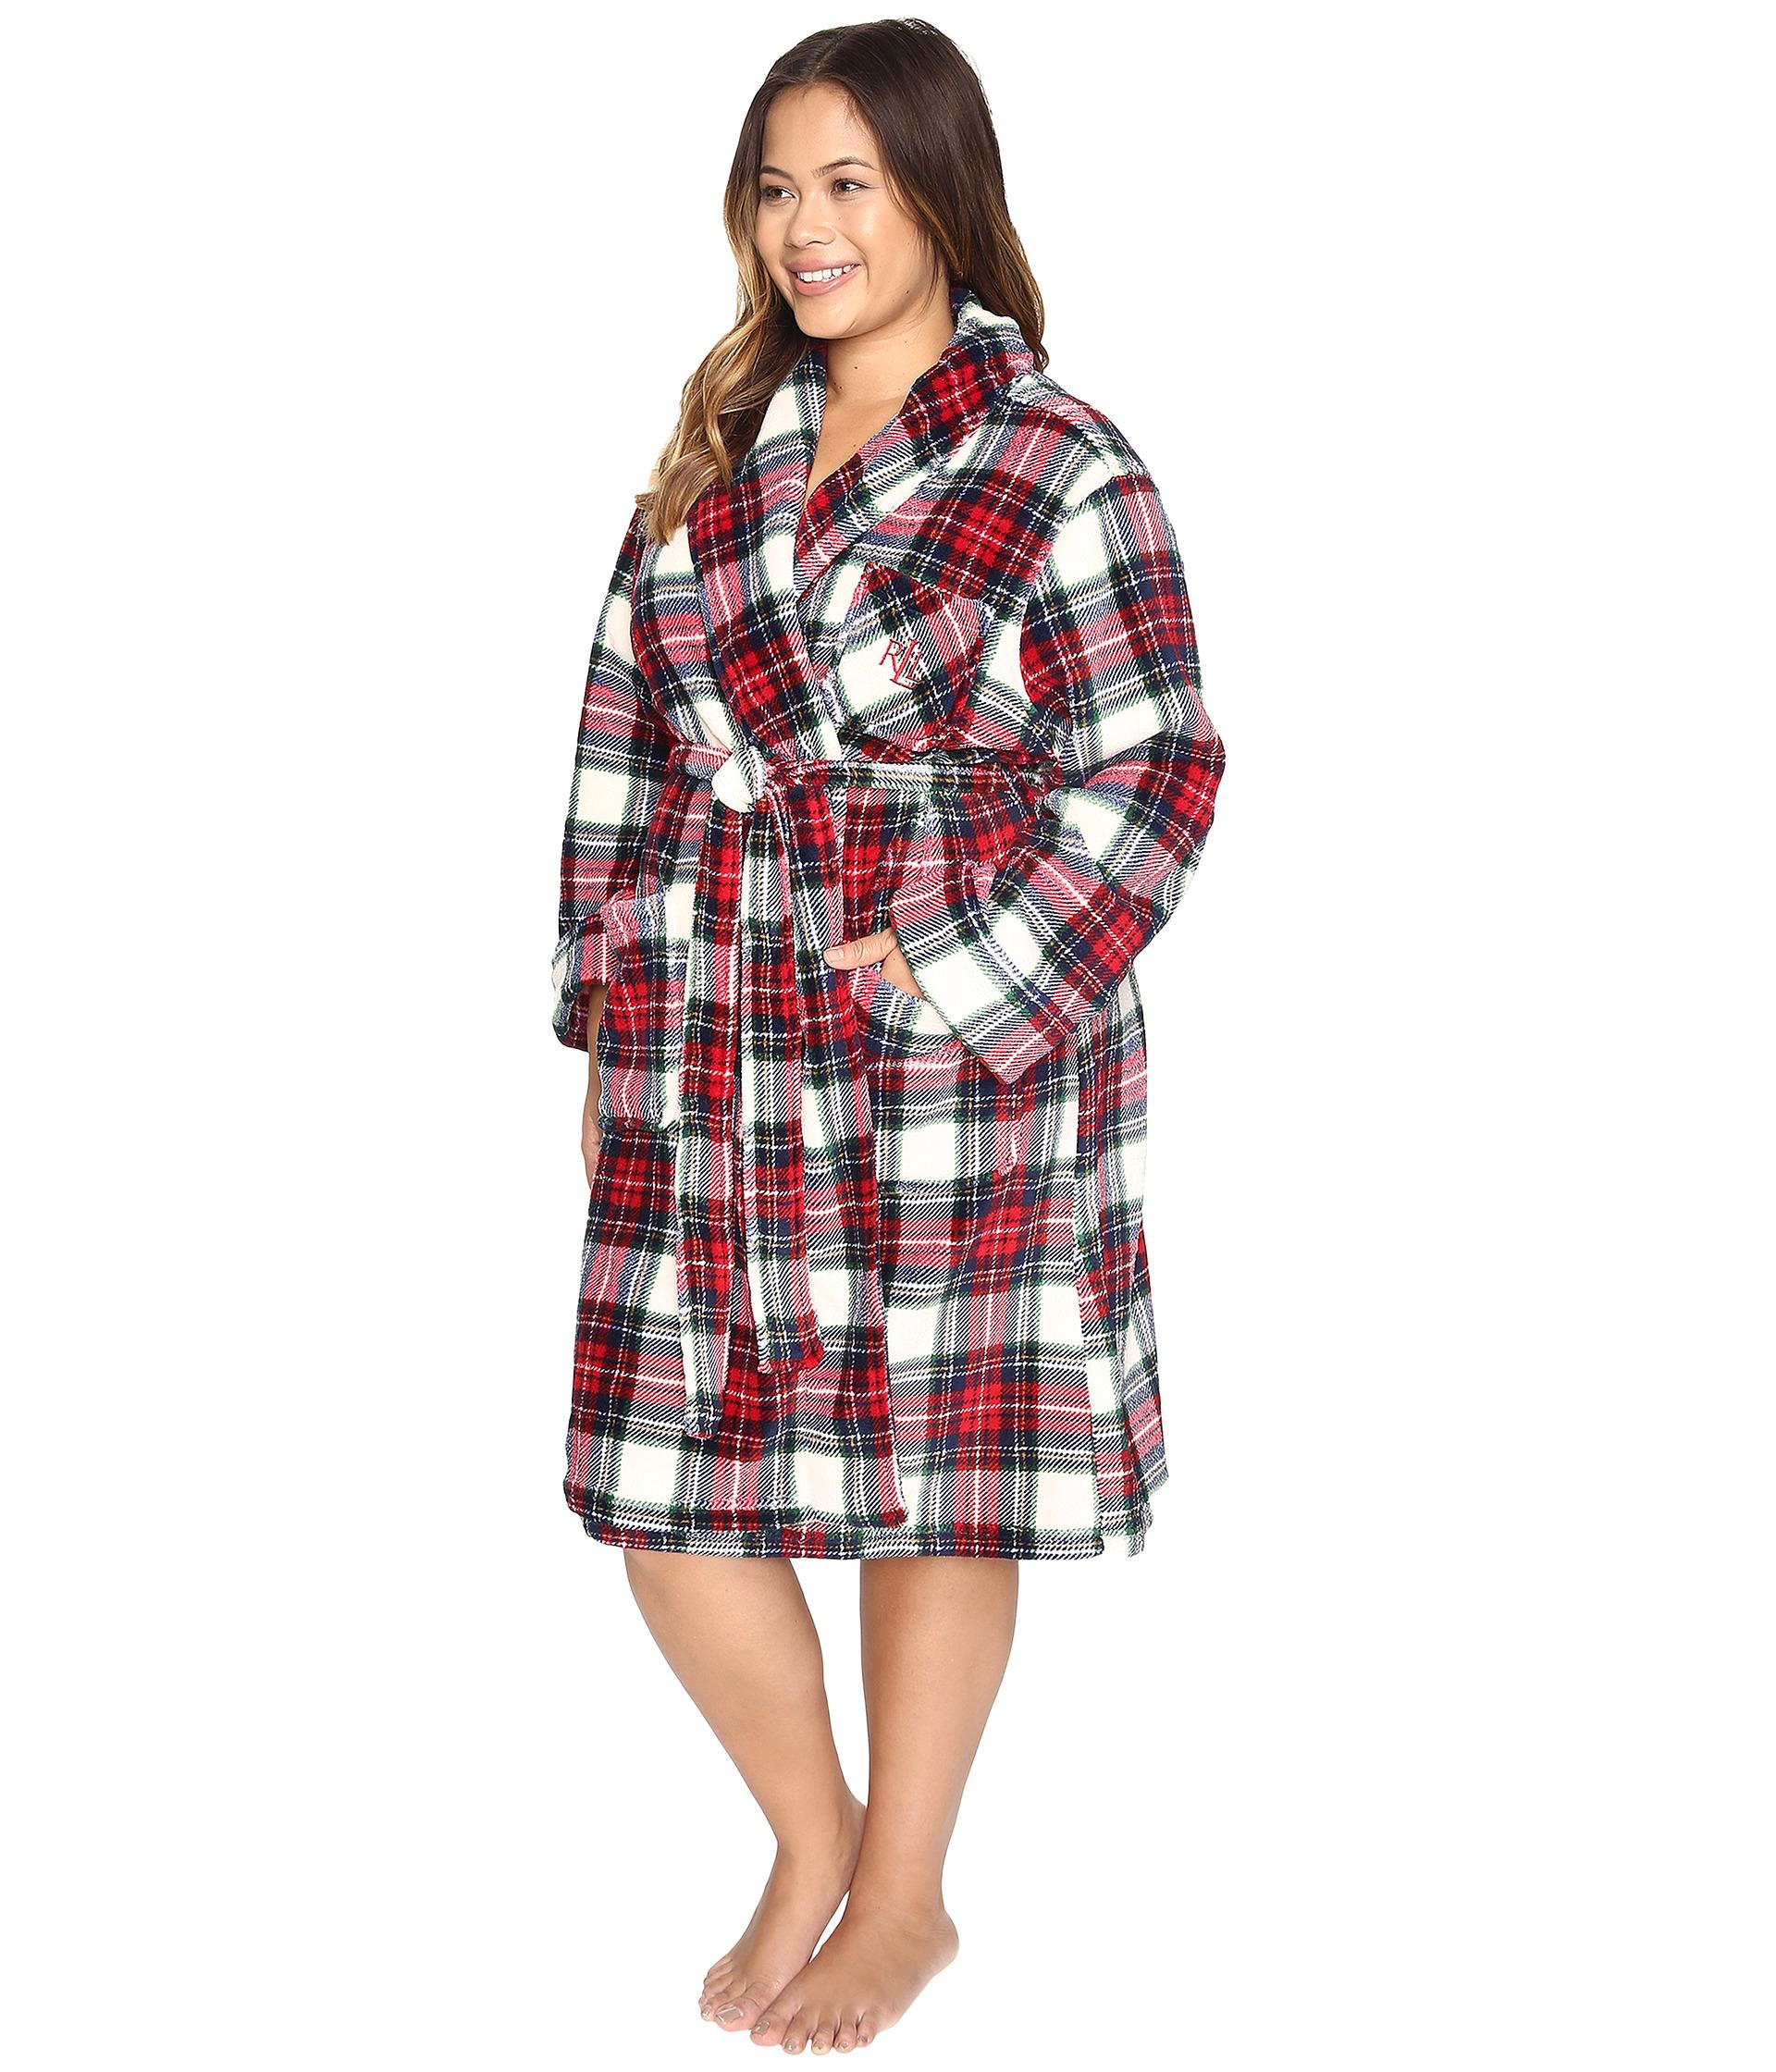 lauren ralph lauren plus size folded so soft terry short robe free shipping both ways. Black Bedroom Furniture Sets. Home Design Ideas